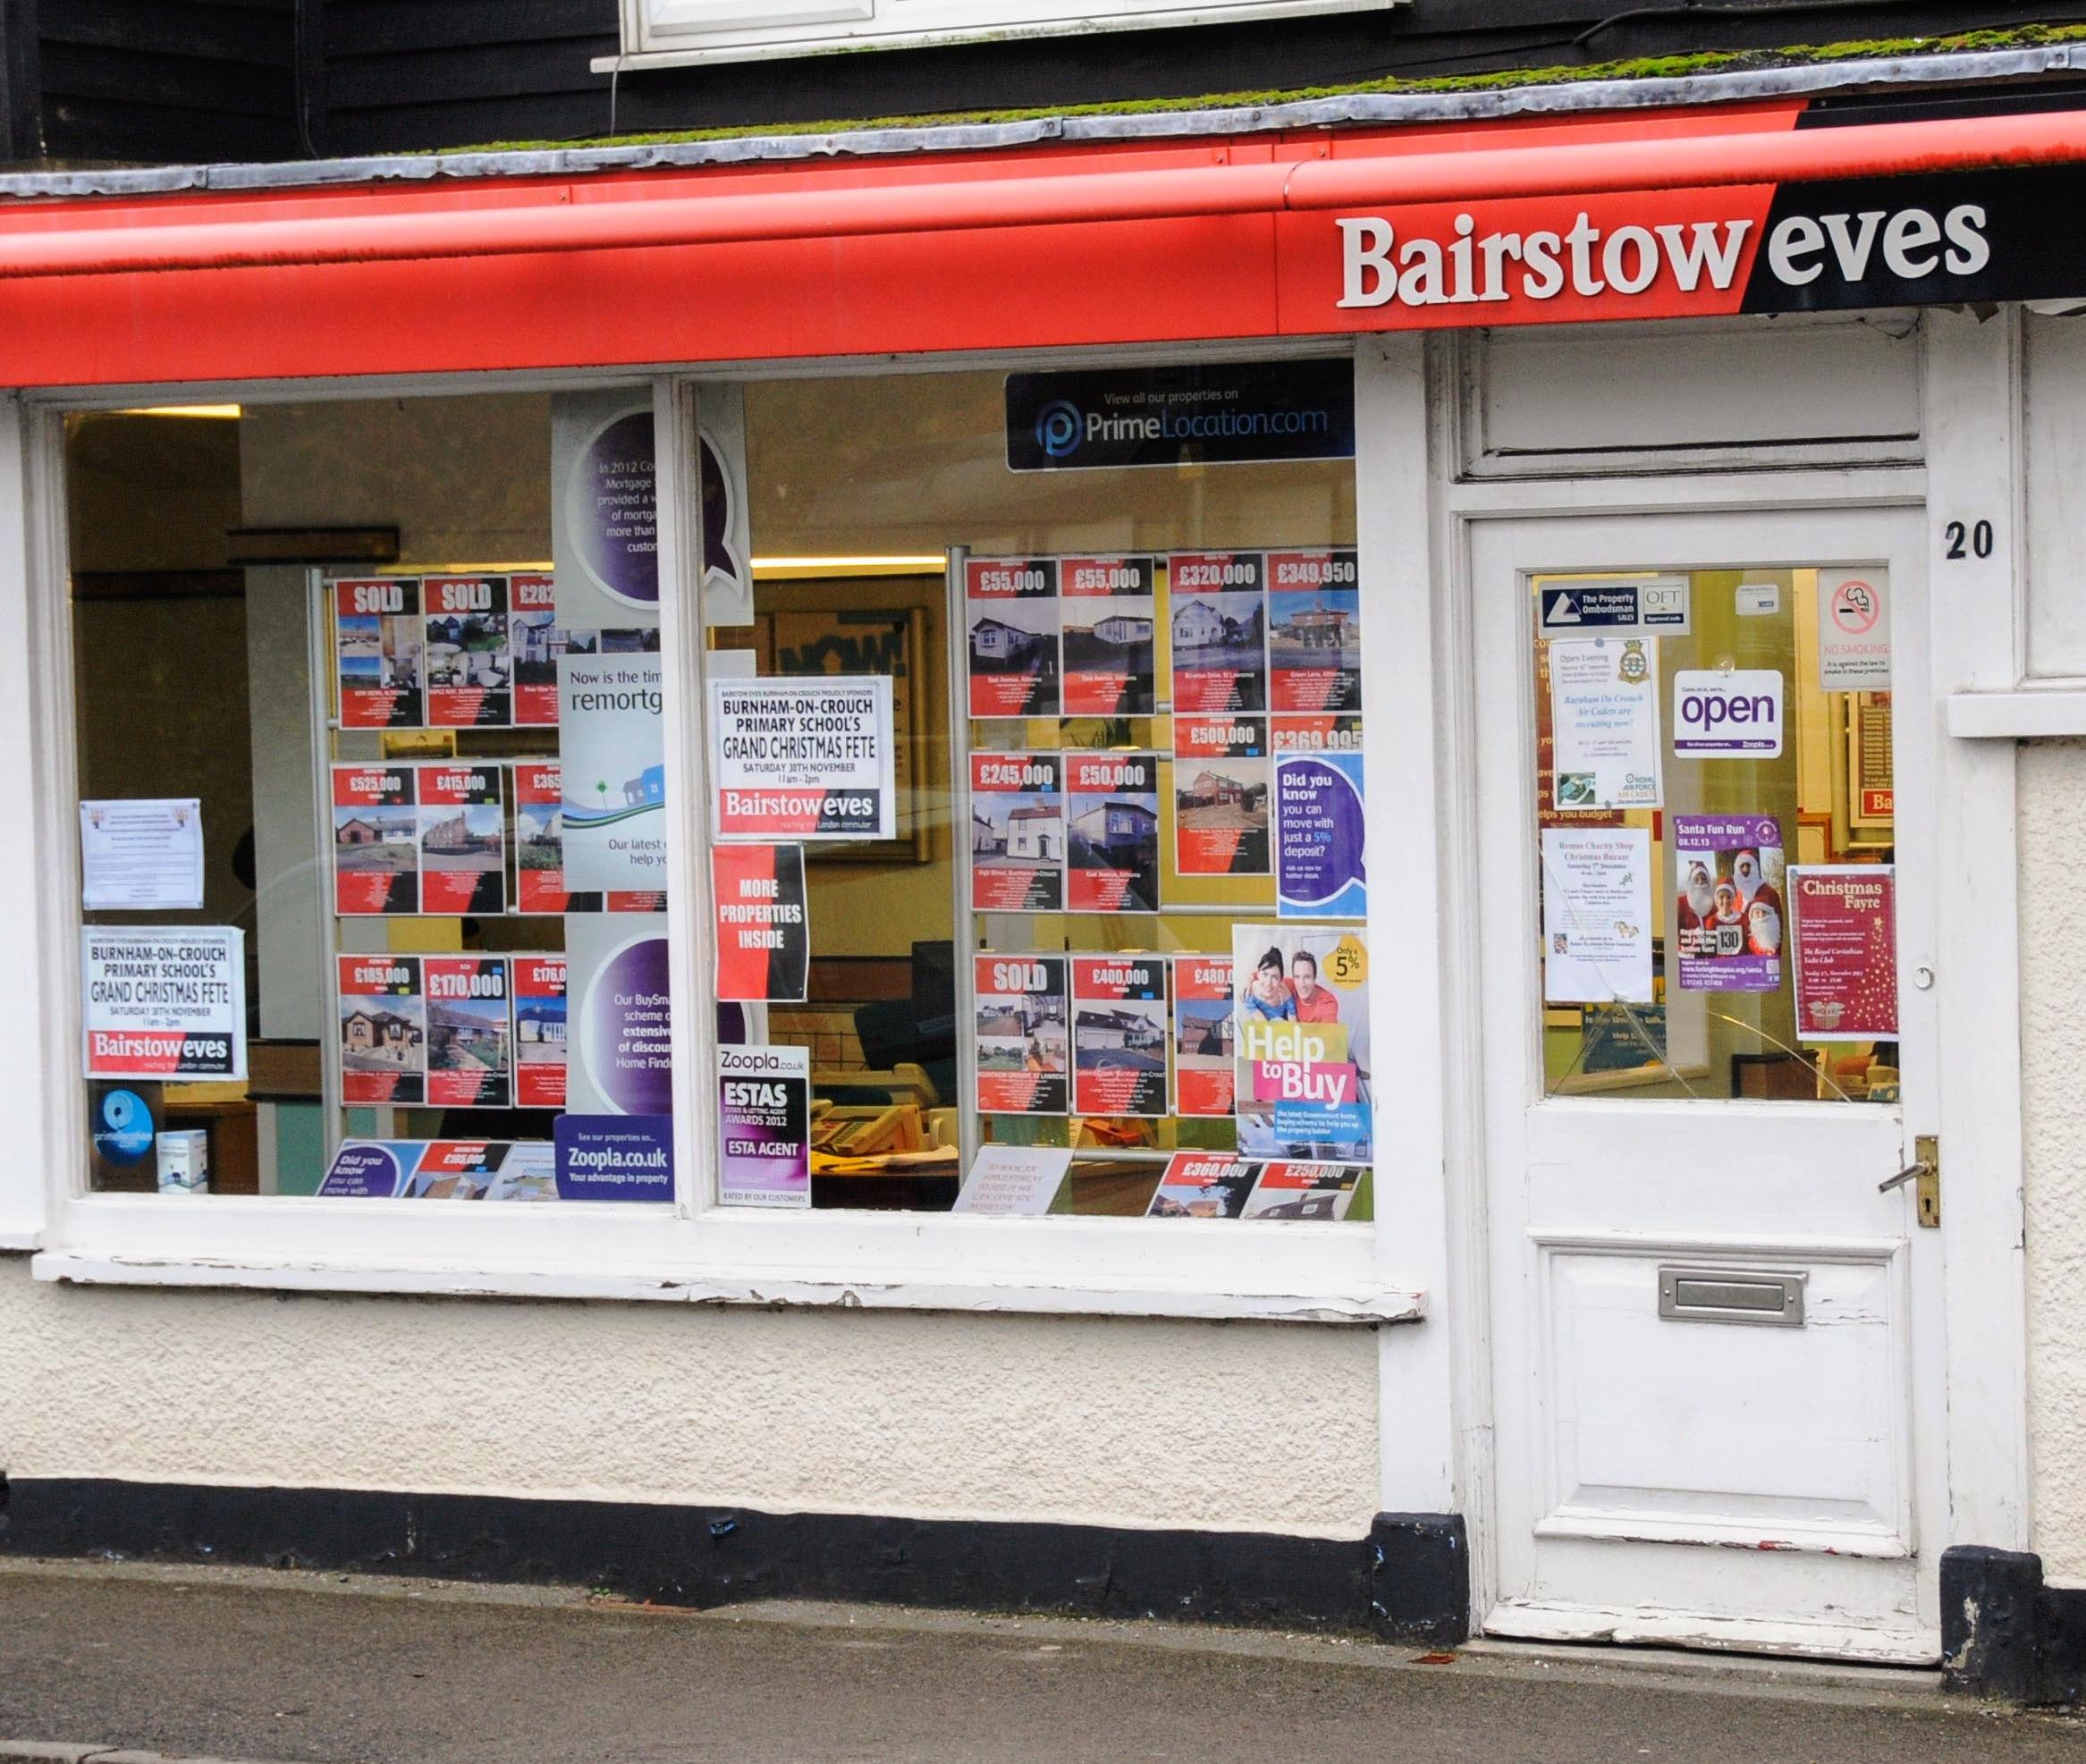 Bairstow Eves Estate Agents Burnham on Crouch